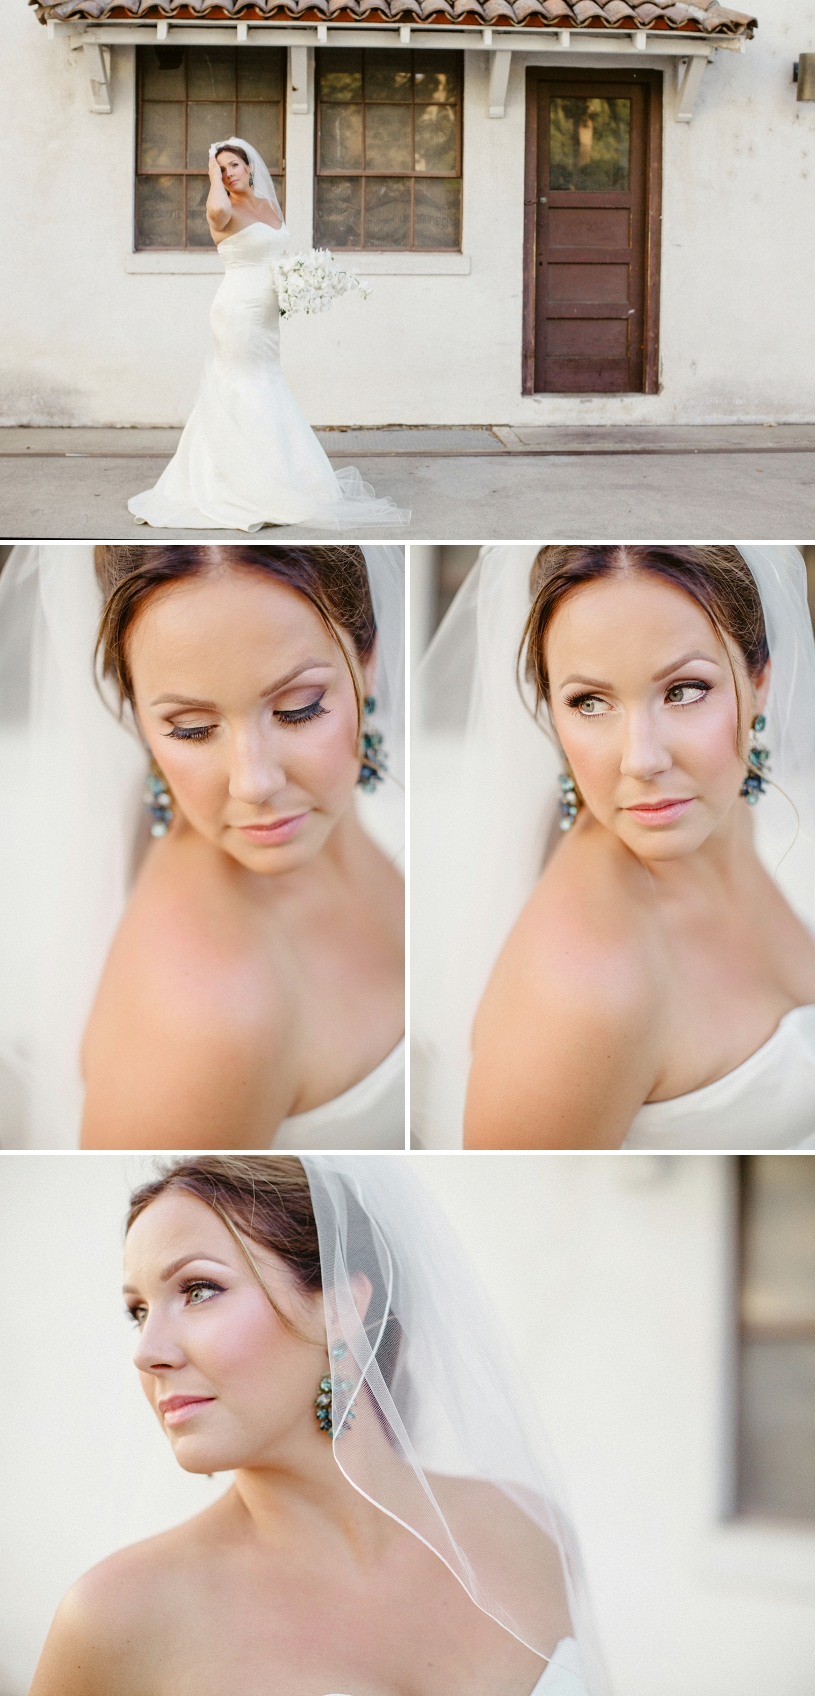 modern cat eye makeup look at a wente vneyard wedding